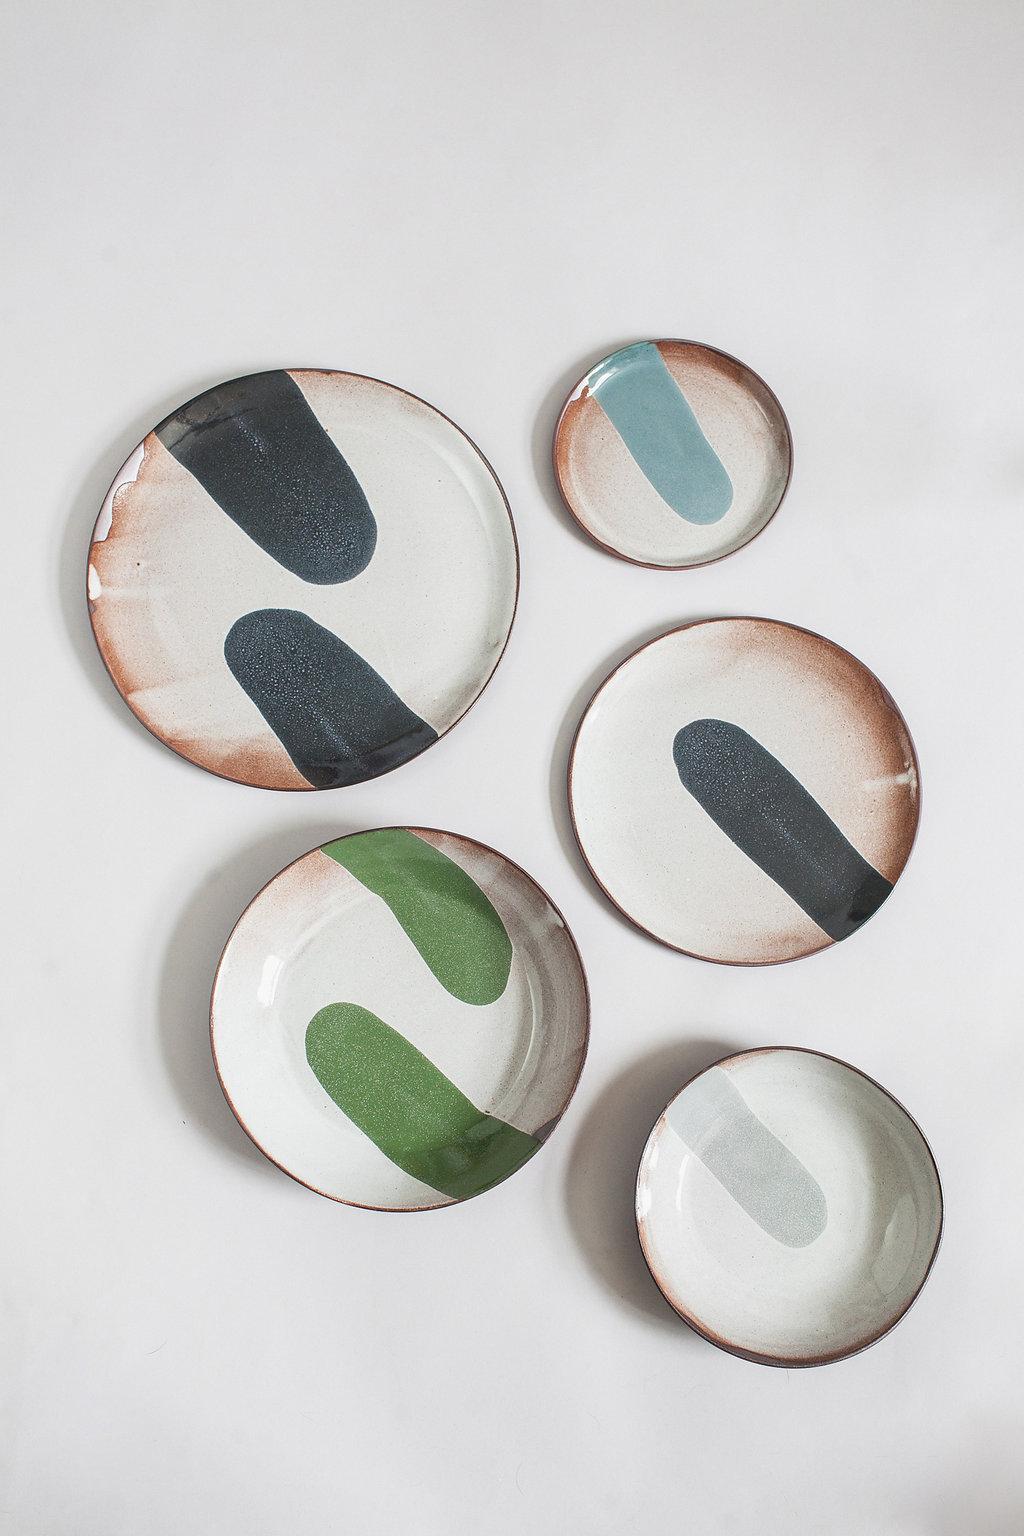 The Ceramics by Silvia K Ceramics